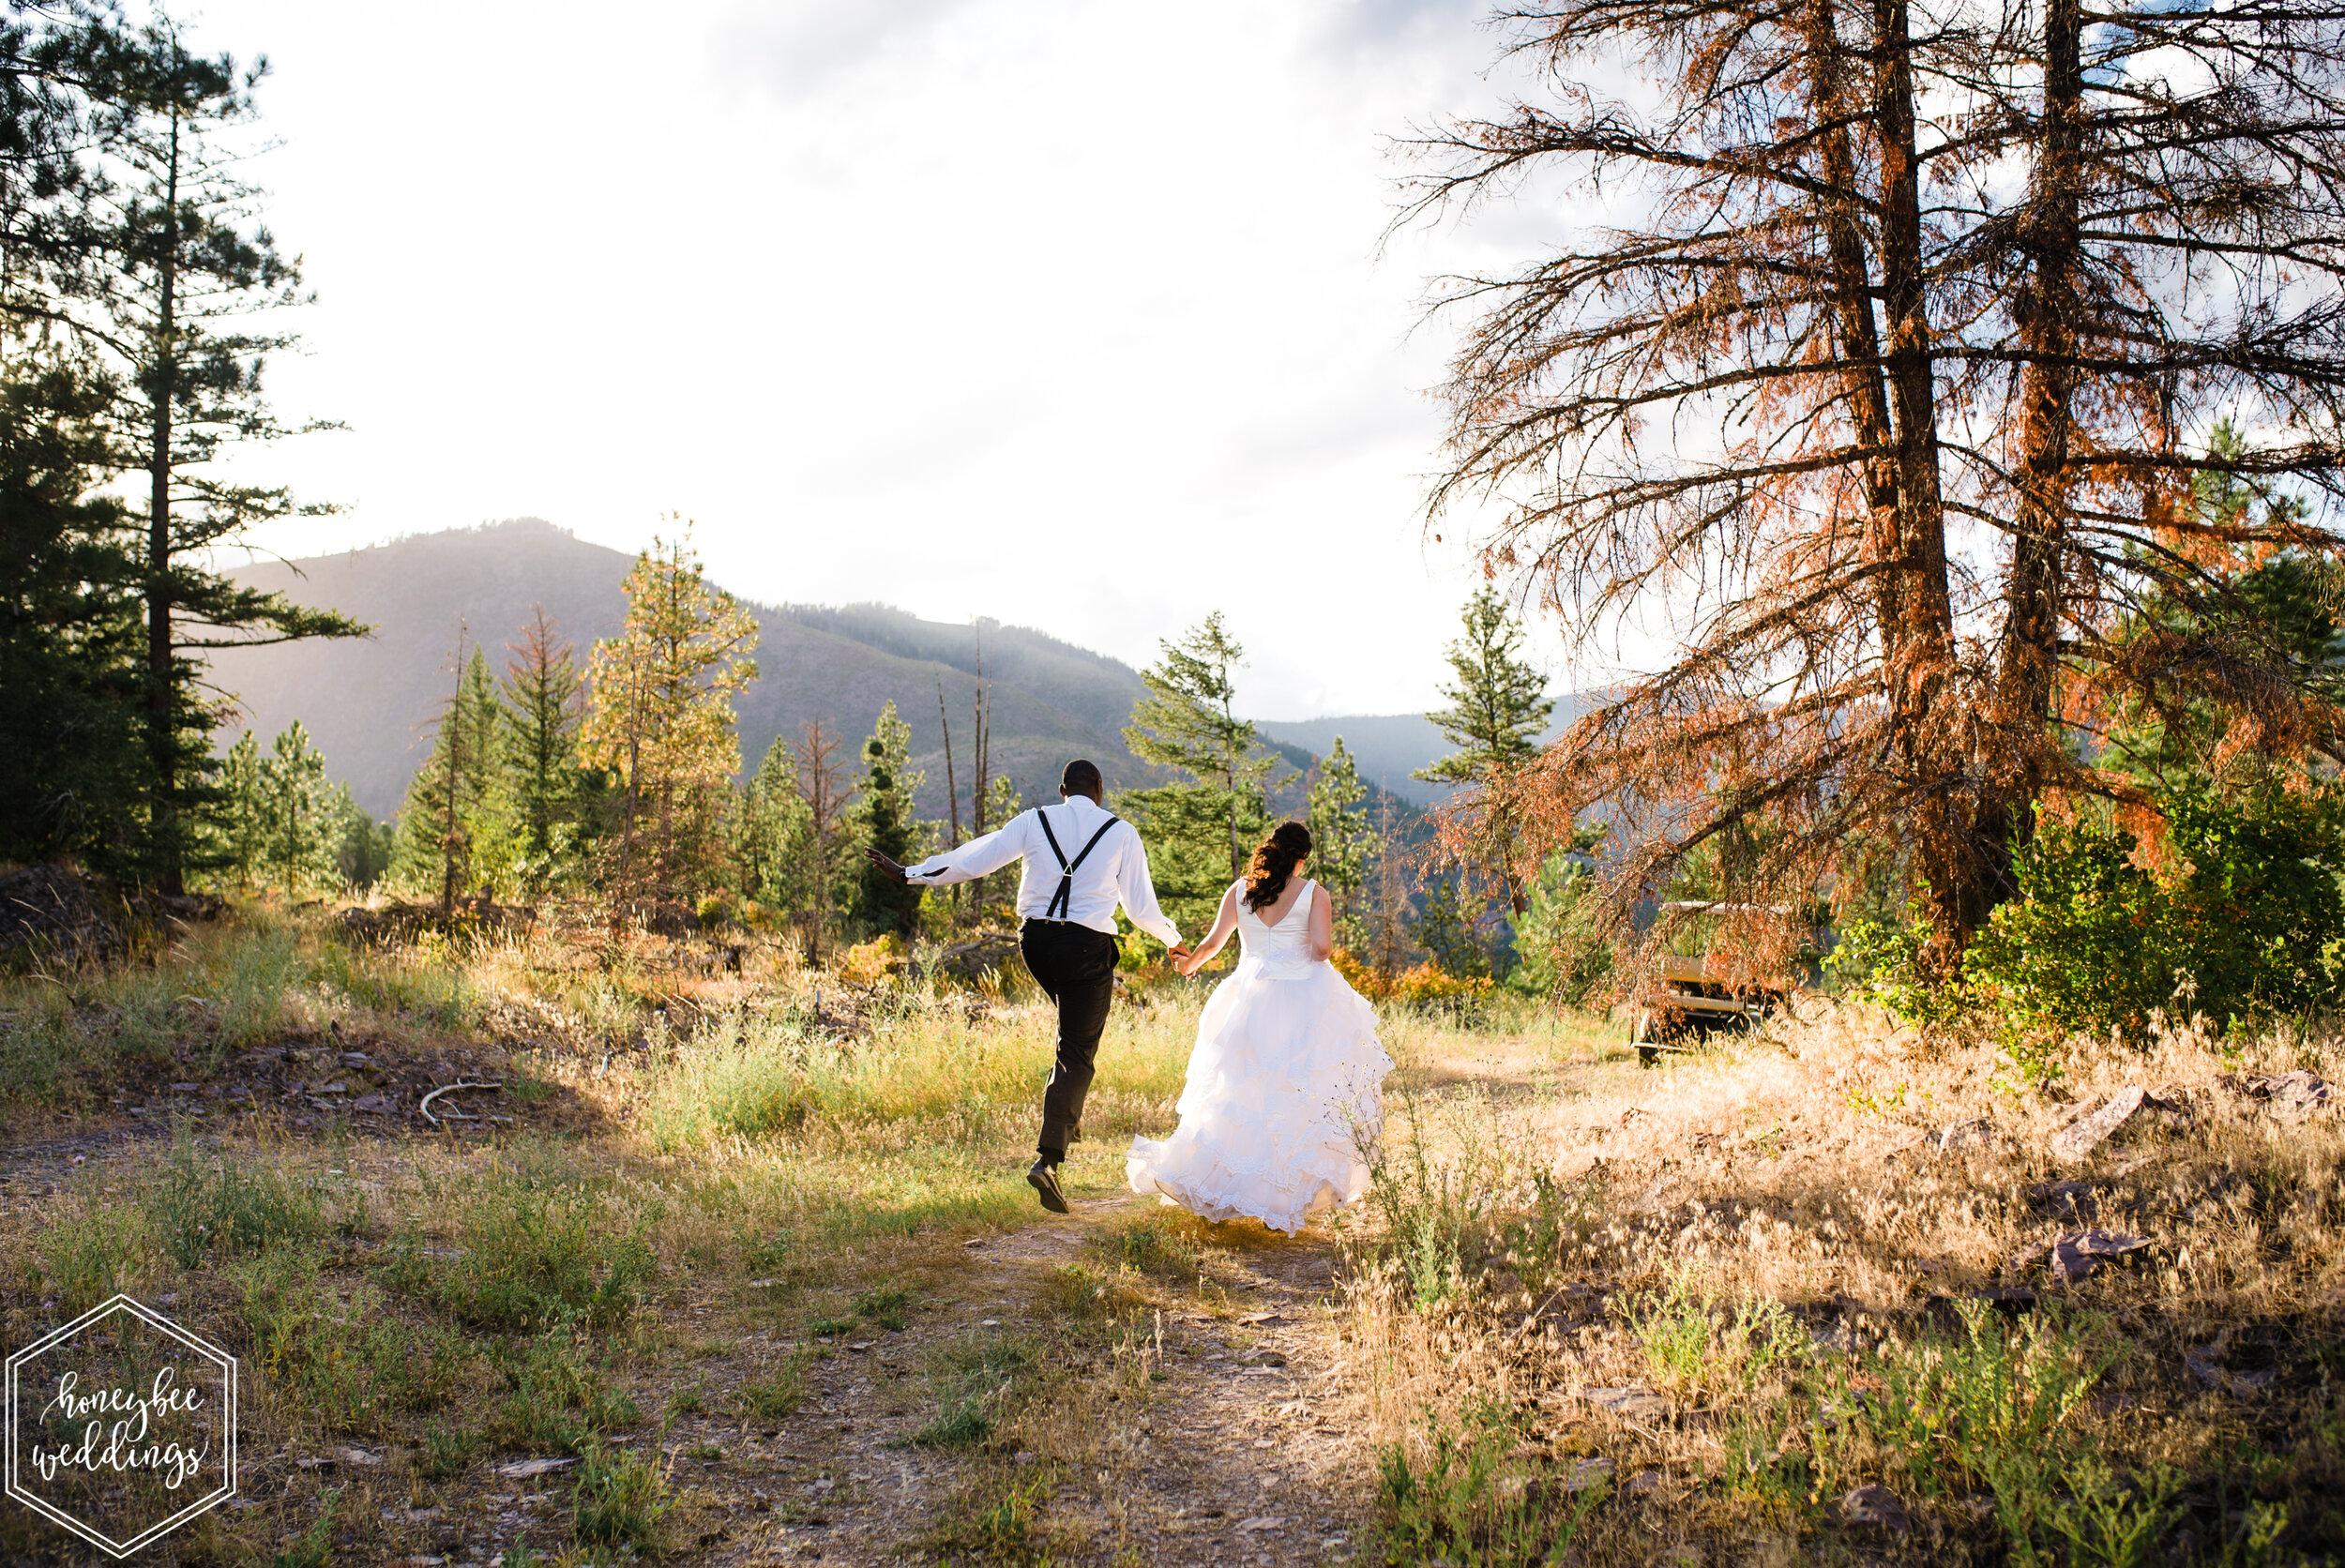 212White Raven Wedding_Montana Wedding Photographer_Rebekah & Likom_Honeybee Weddings_July 27, 2019-702.jpg